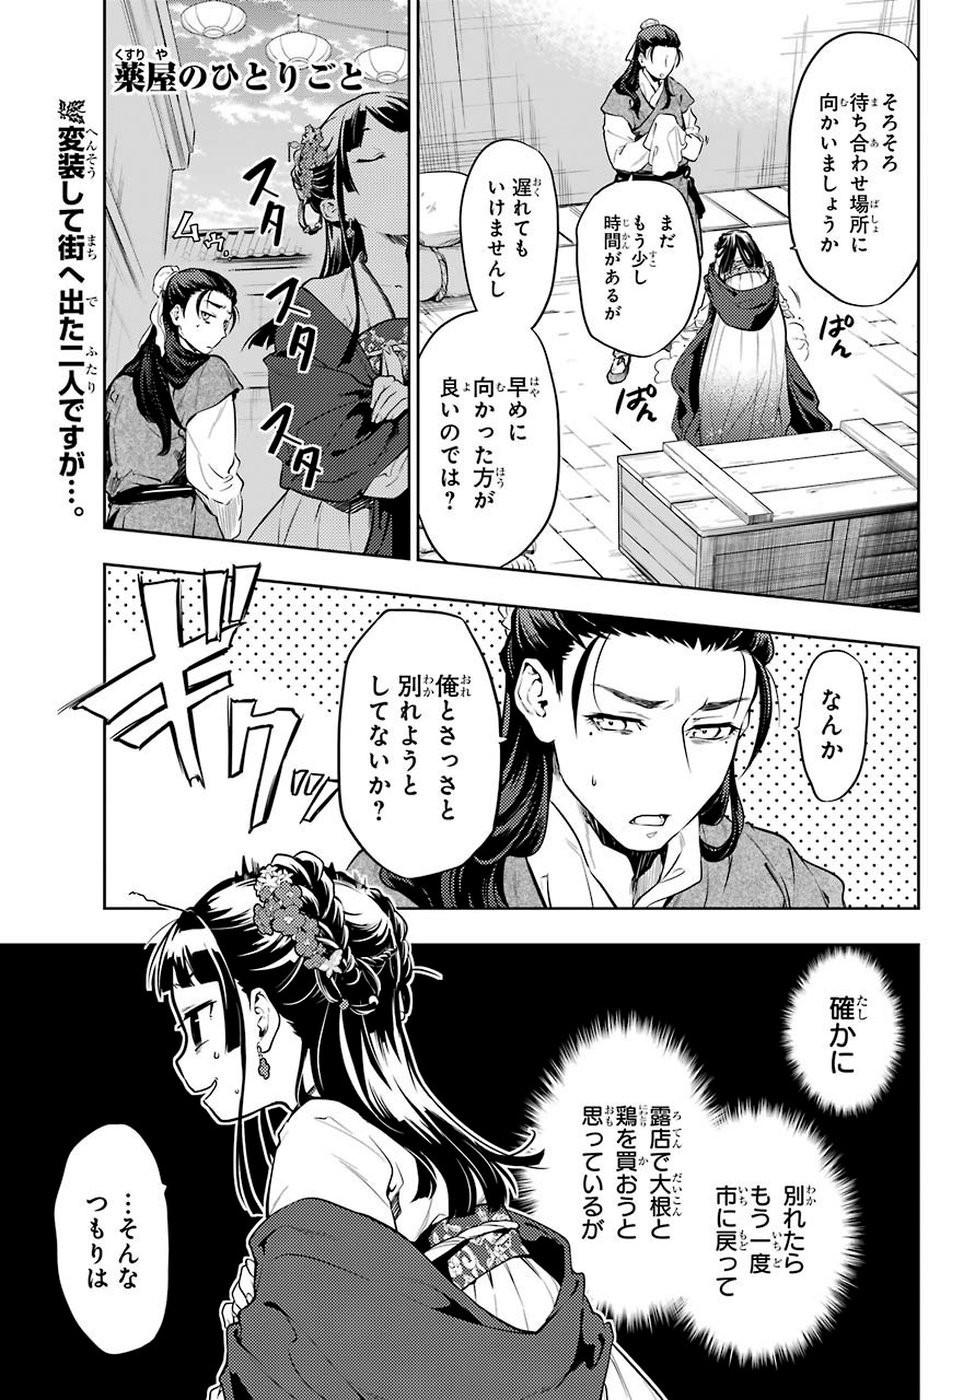 Kusuriya-no-Hitorigoto - Chapter 28-1 - Page 1